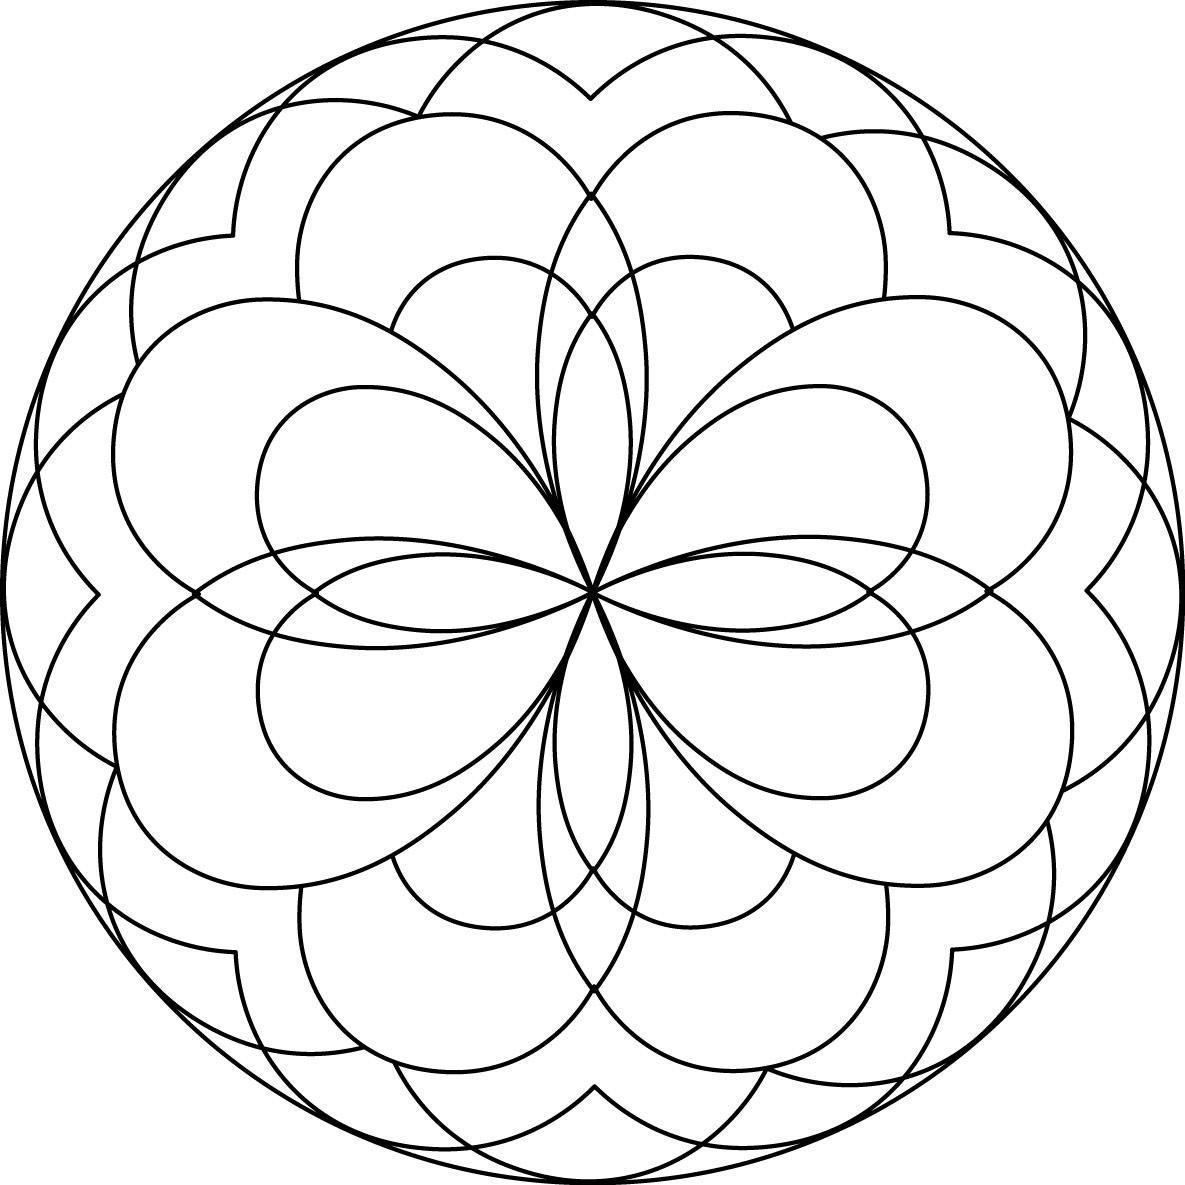 1185x1185 Simple Mandala Mandalas Coloring Pages For Kids To Print Color